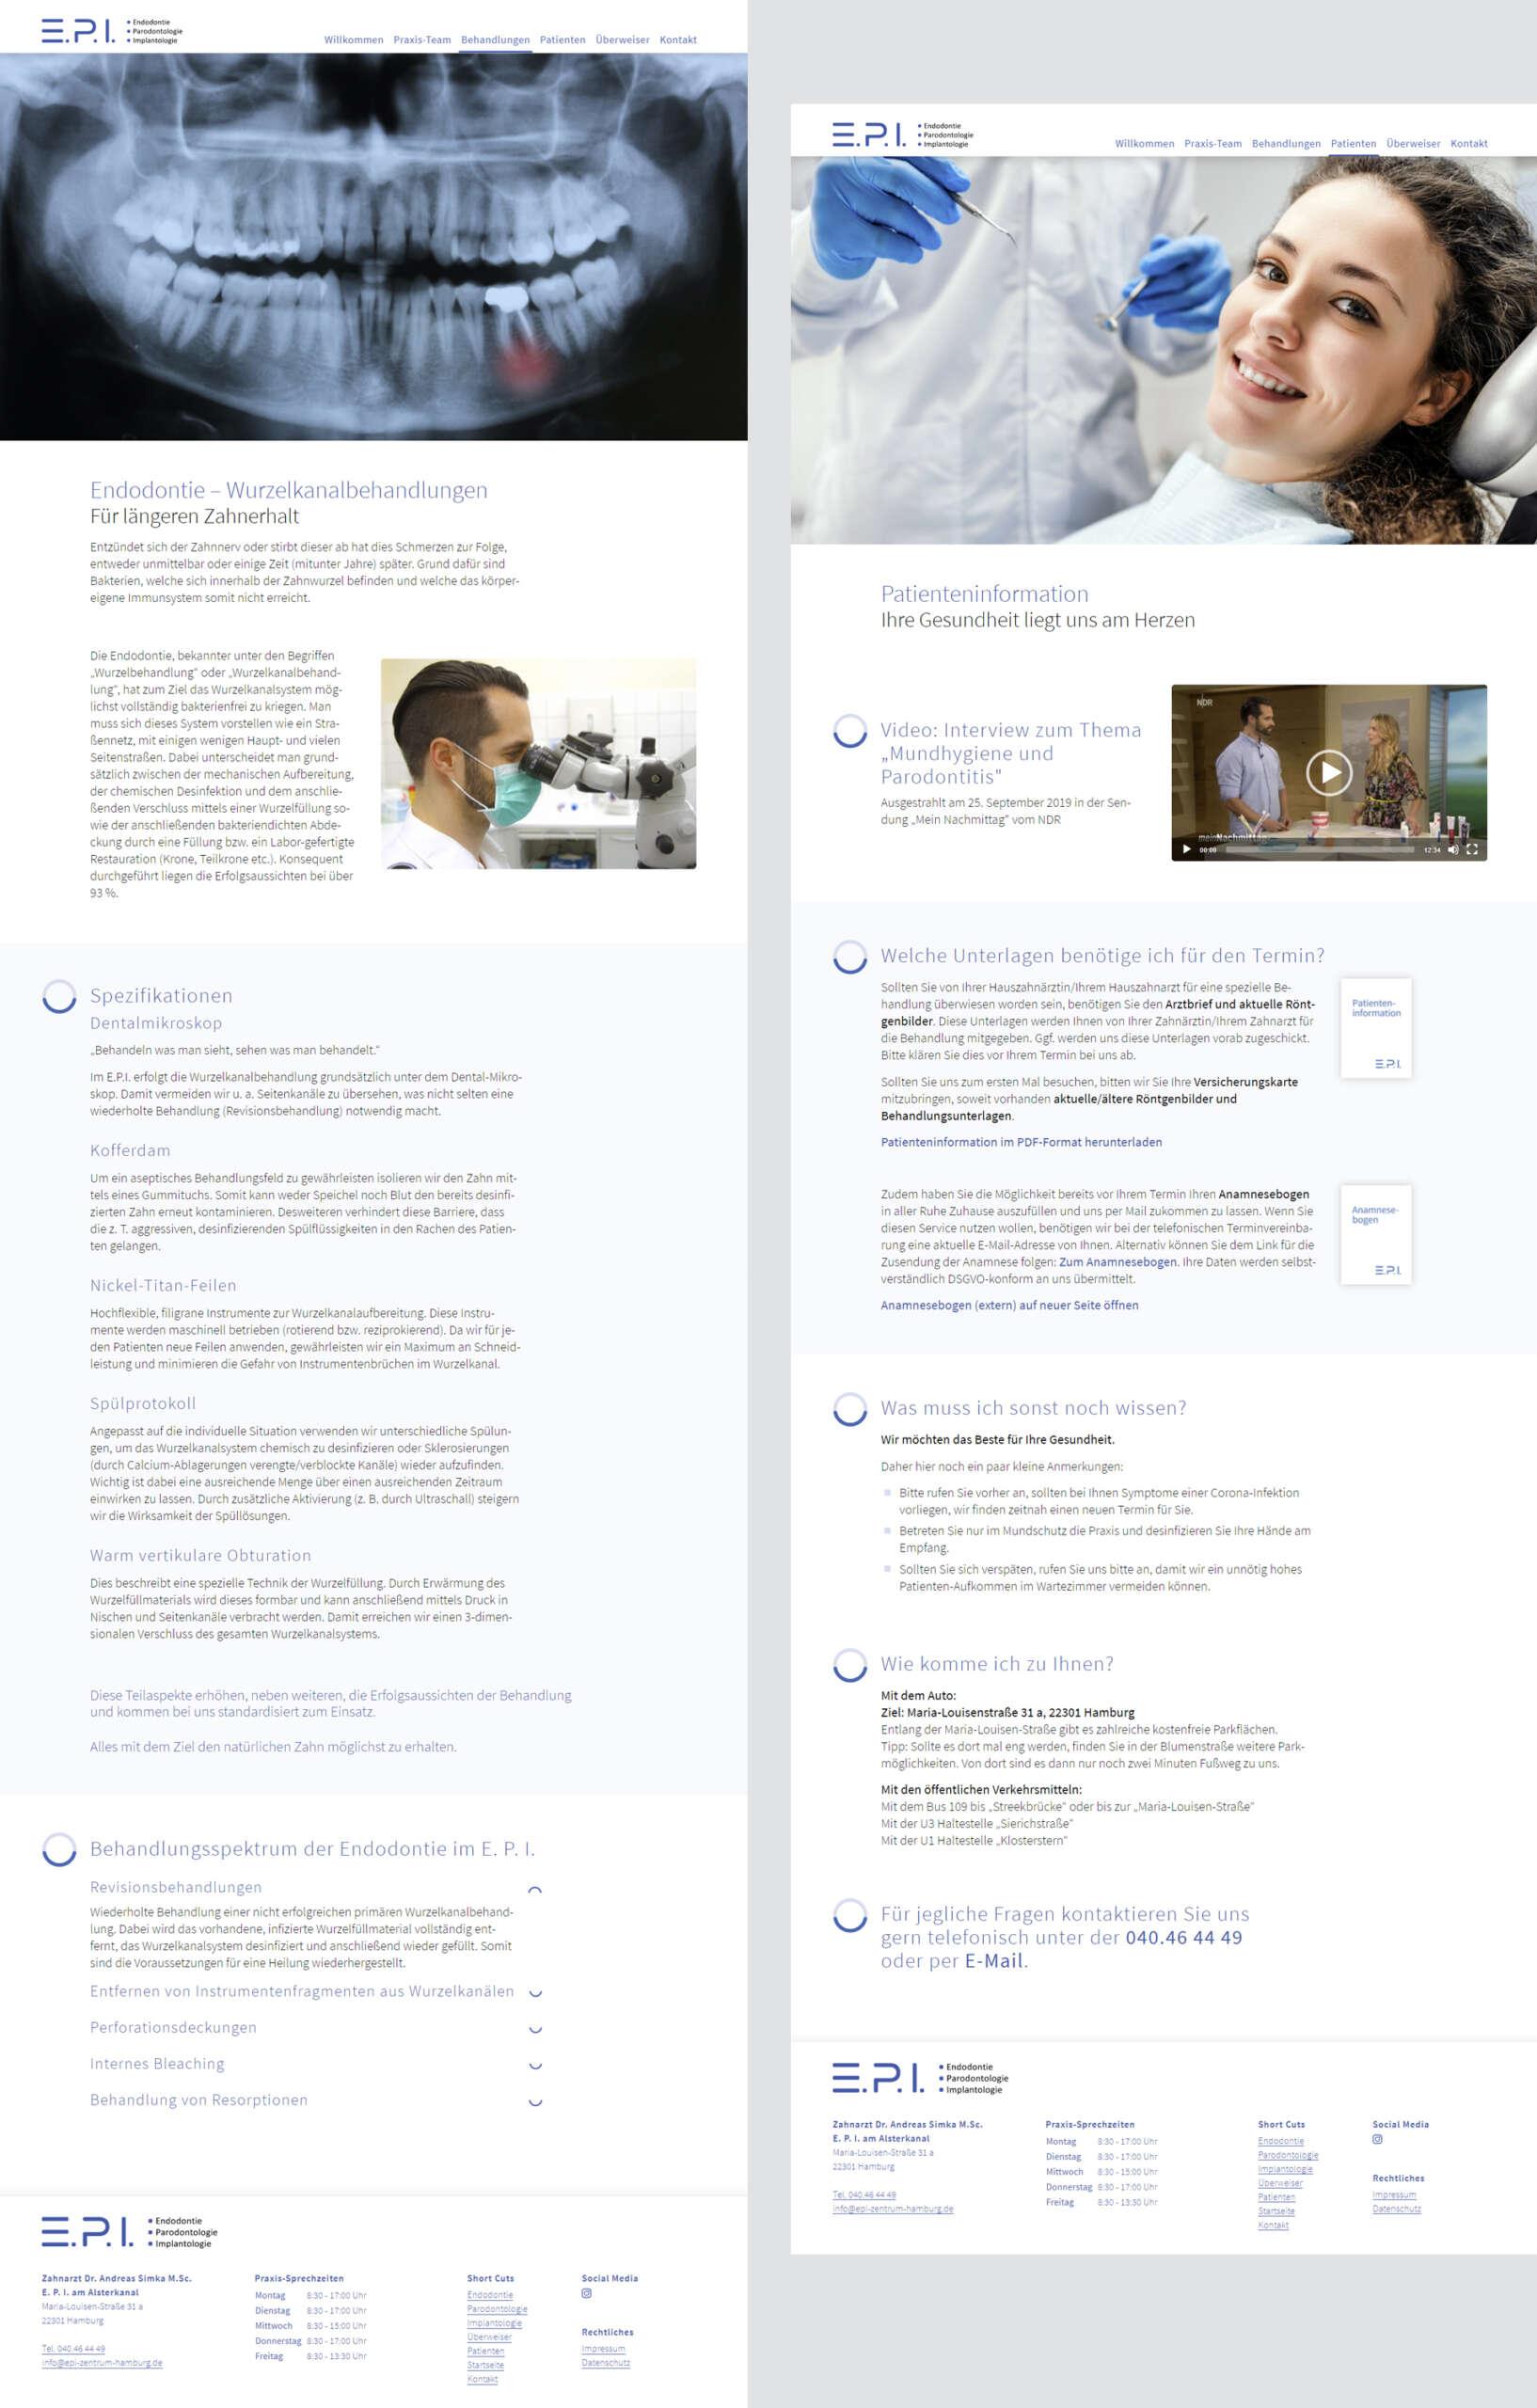 epi_zahnarzt-website_design2